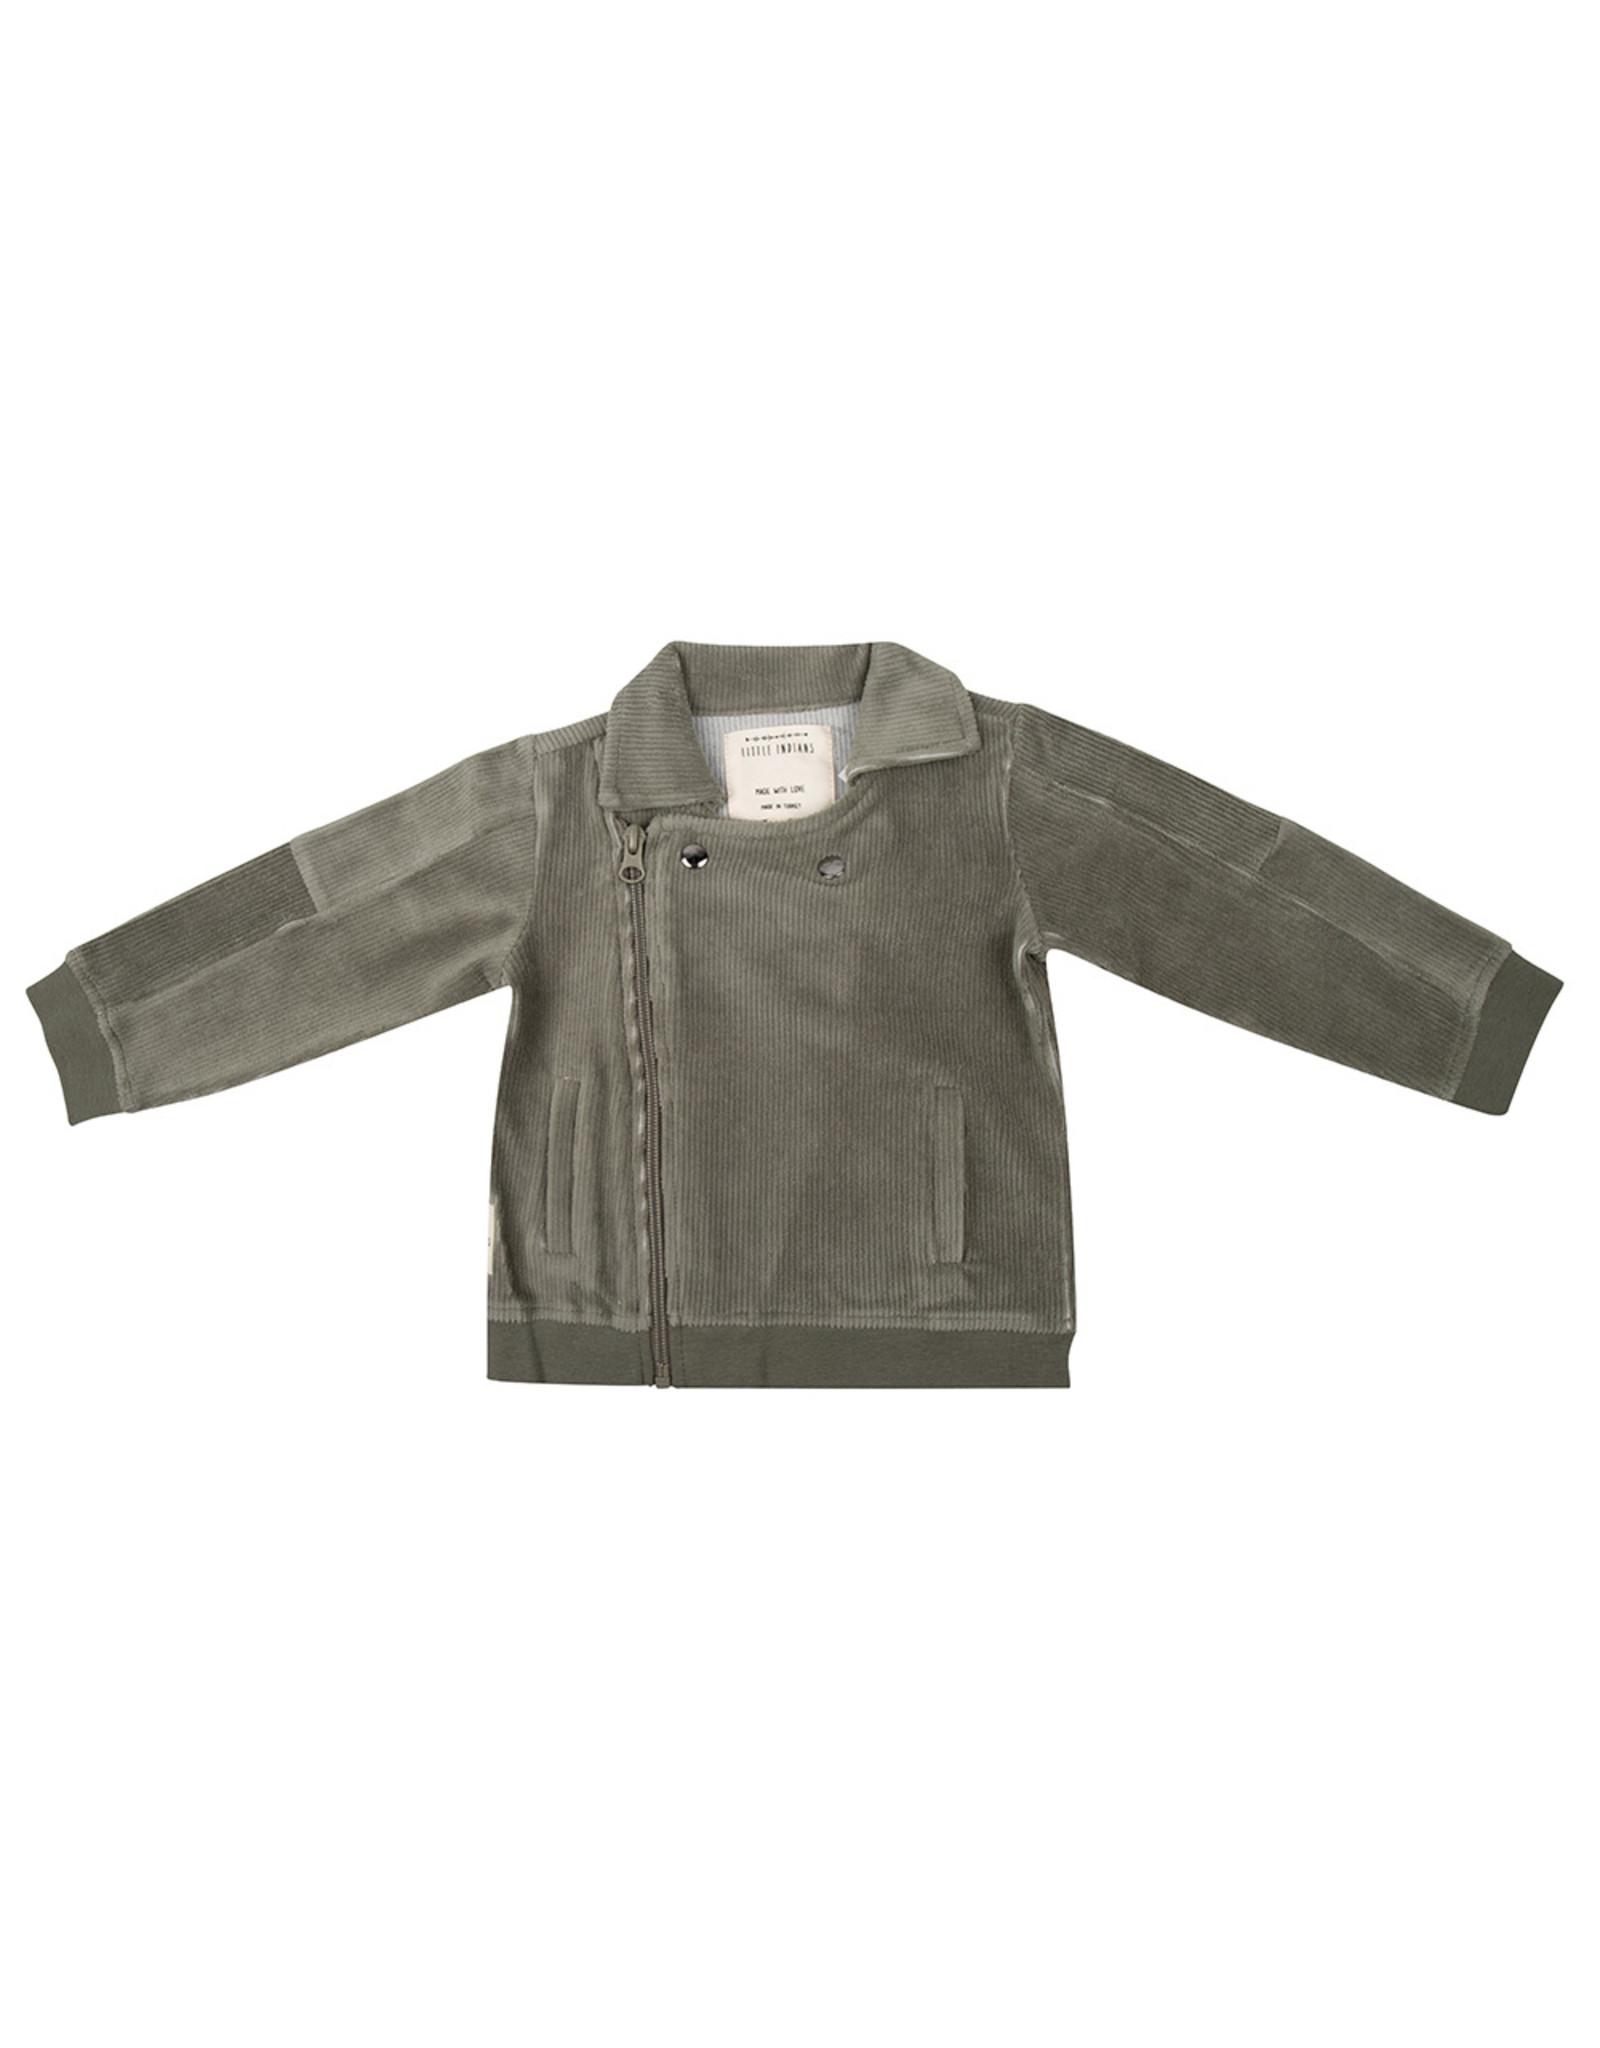 Little Indians Jacket - Corduroy Green